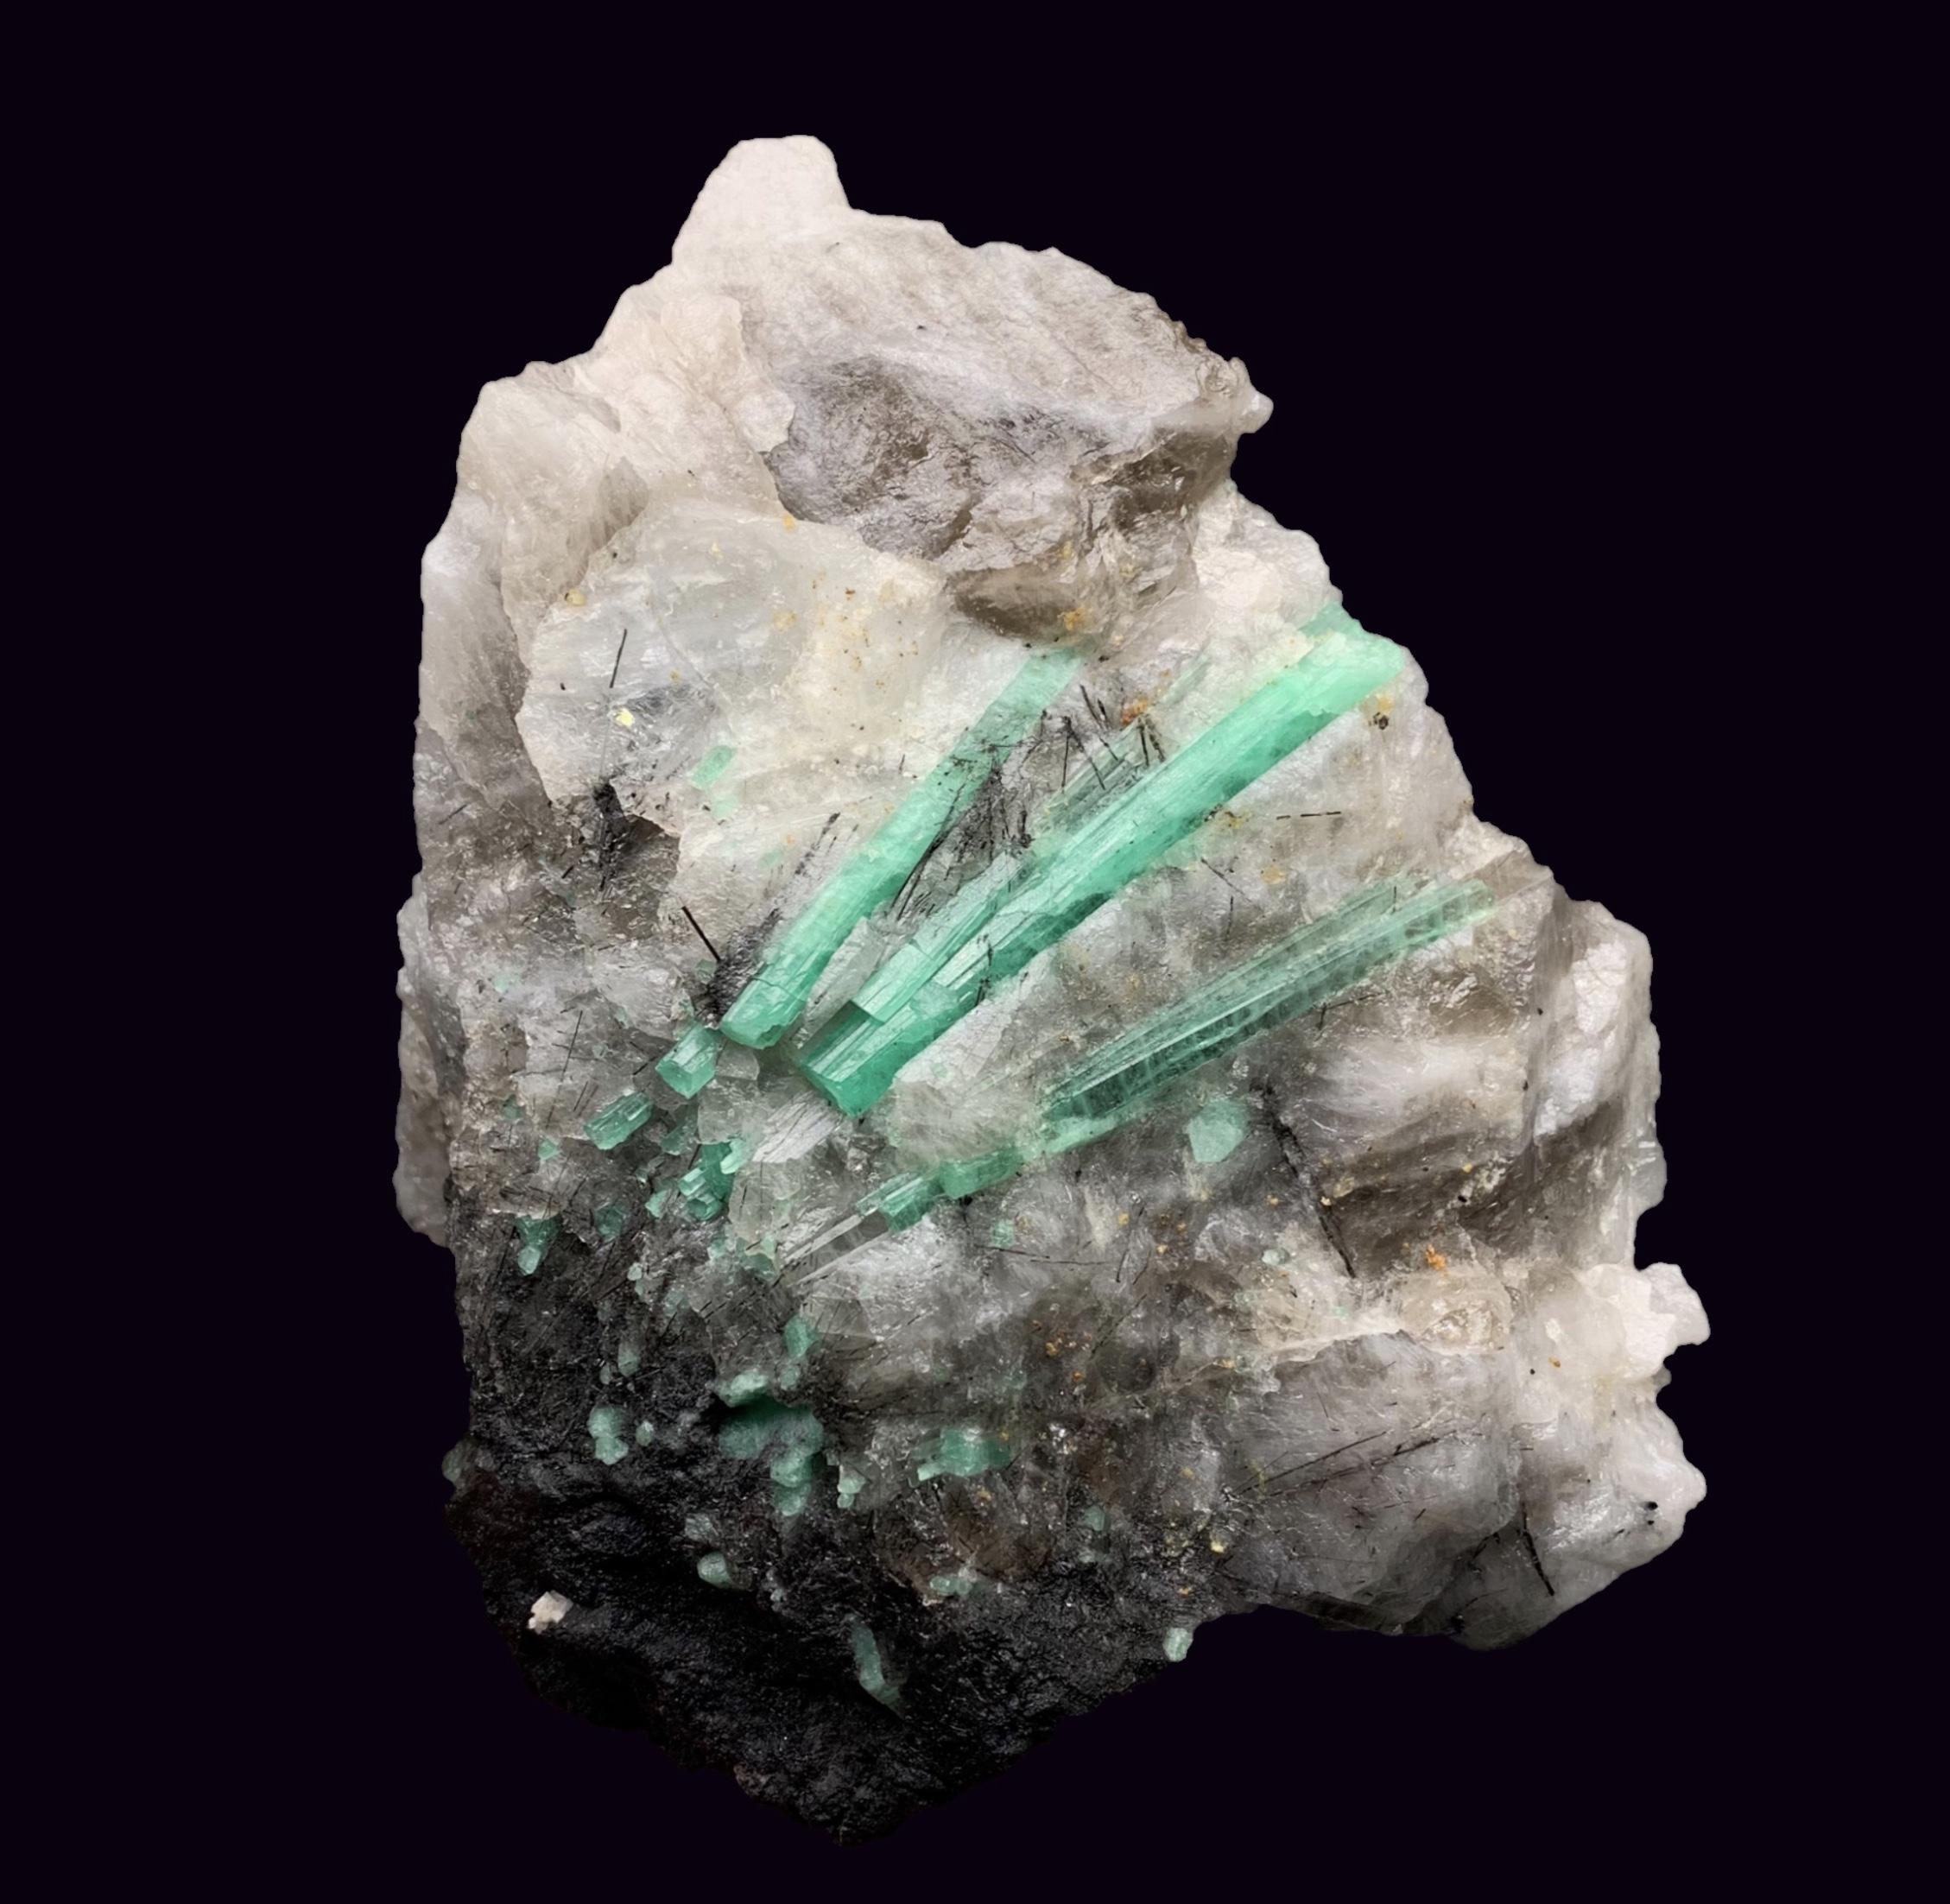 Кристаллы / Камни Артикул 616051545243